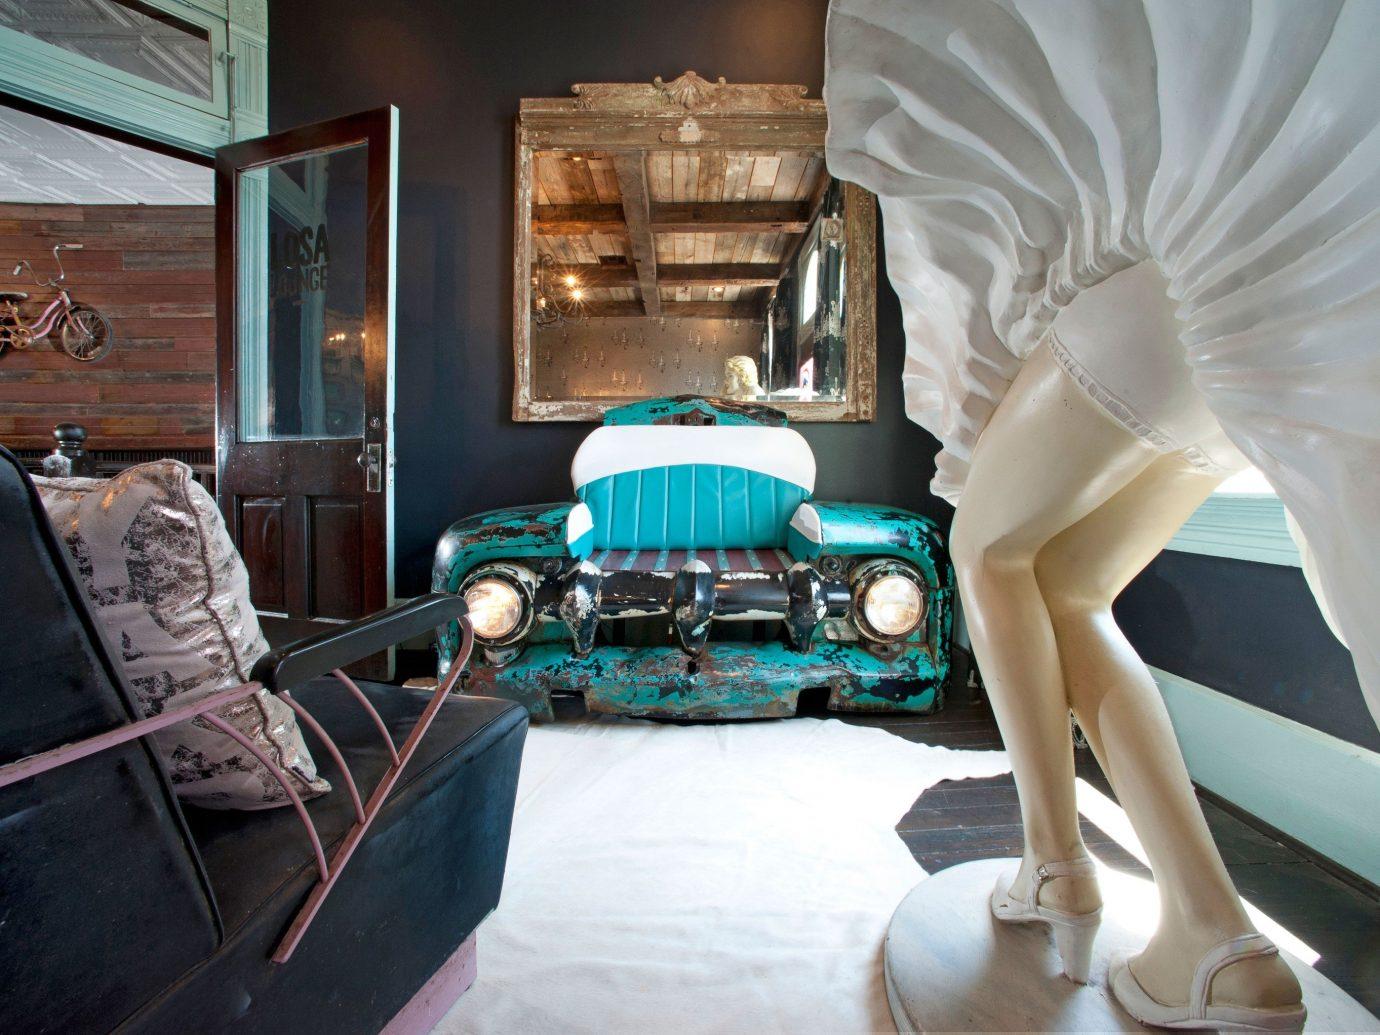 Trip Ideas floor indoor car room vehicle interior design automobile make screenshot furniture